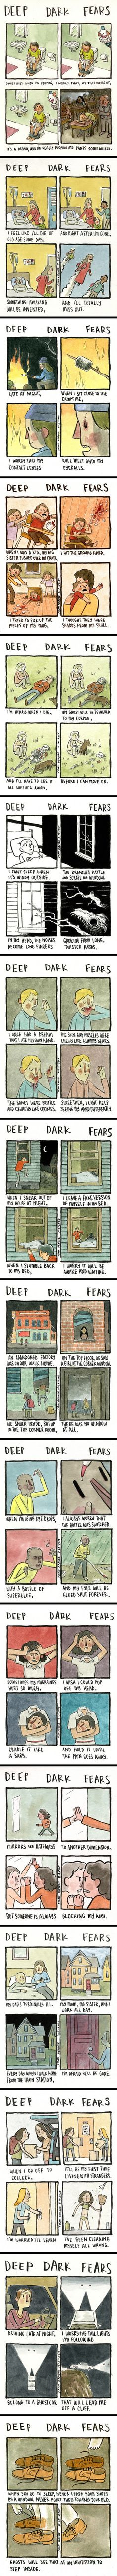 Trendy Quotes Deep Dark Sad So True - Zitate Trauma, Deep Dark Fears, The Awkward Yeti, Creepy Stories, New Quotes, True Quotes, Funny Quotes, Dark Quotes, Short Comics